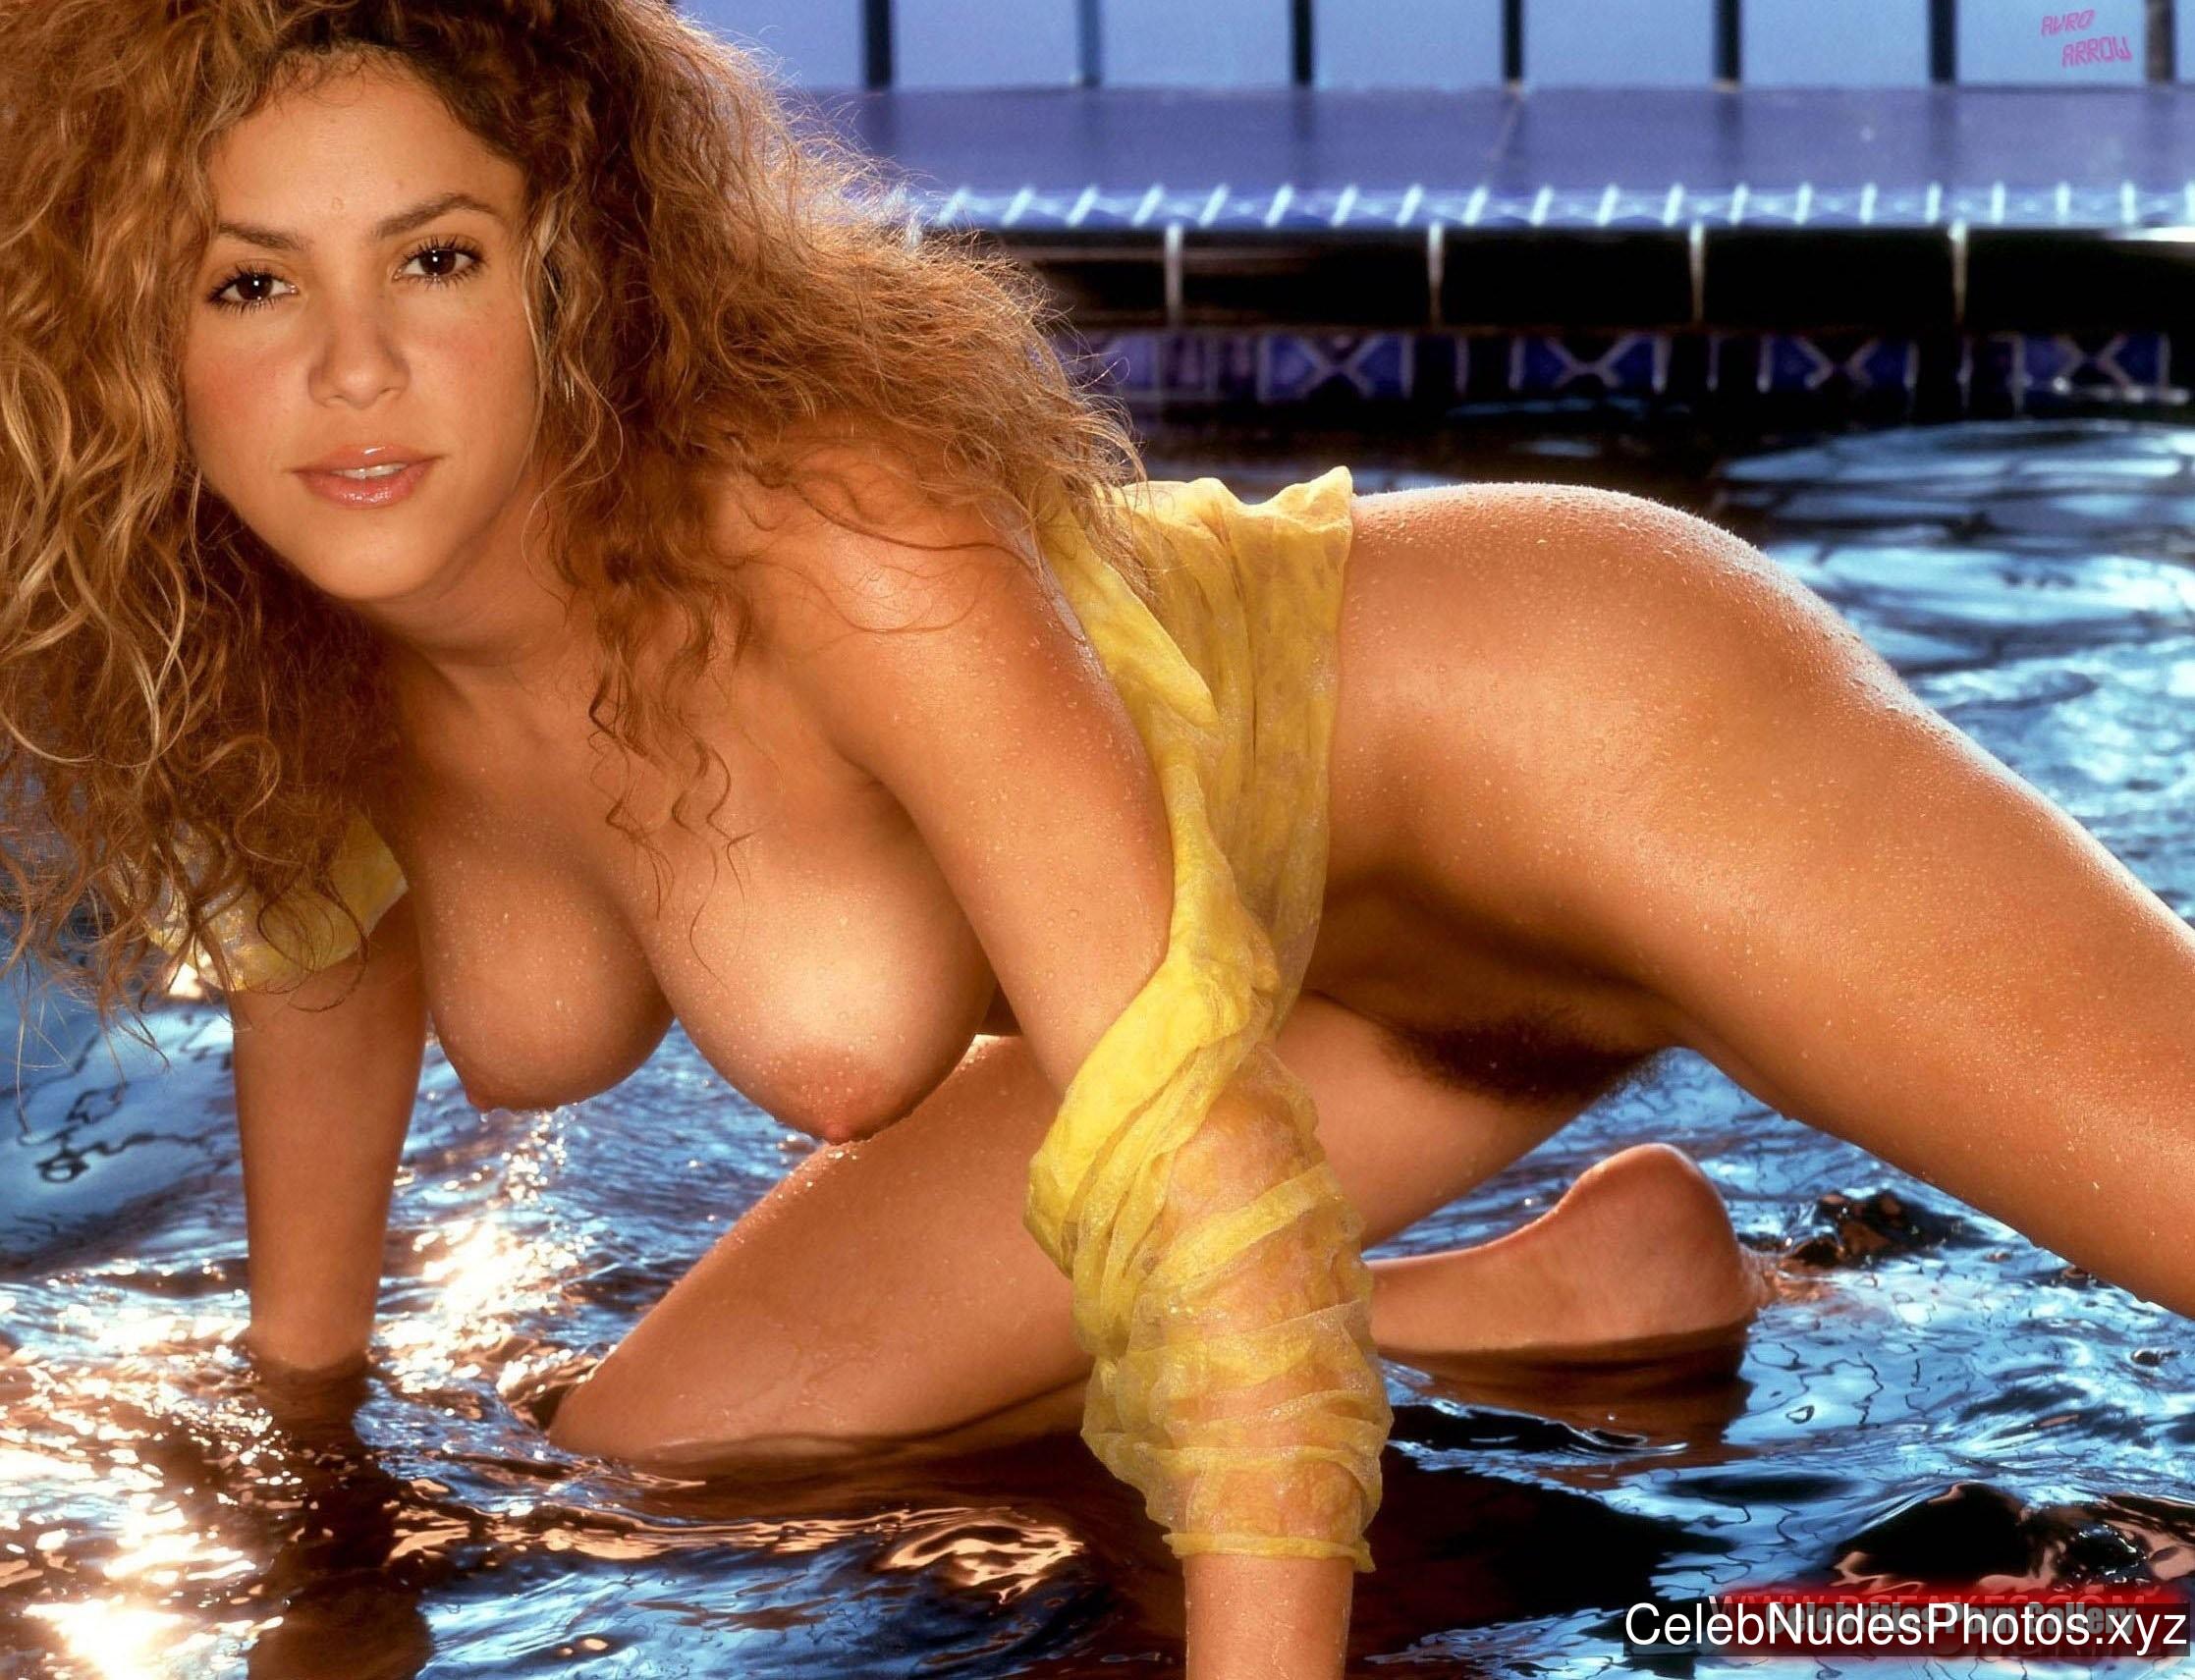 Sorry, that Leaked shakira naked photo share your